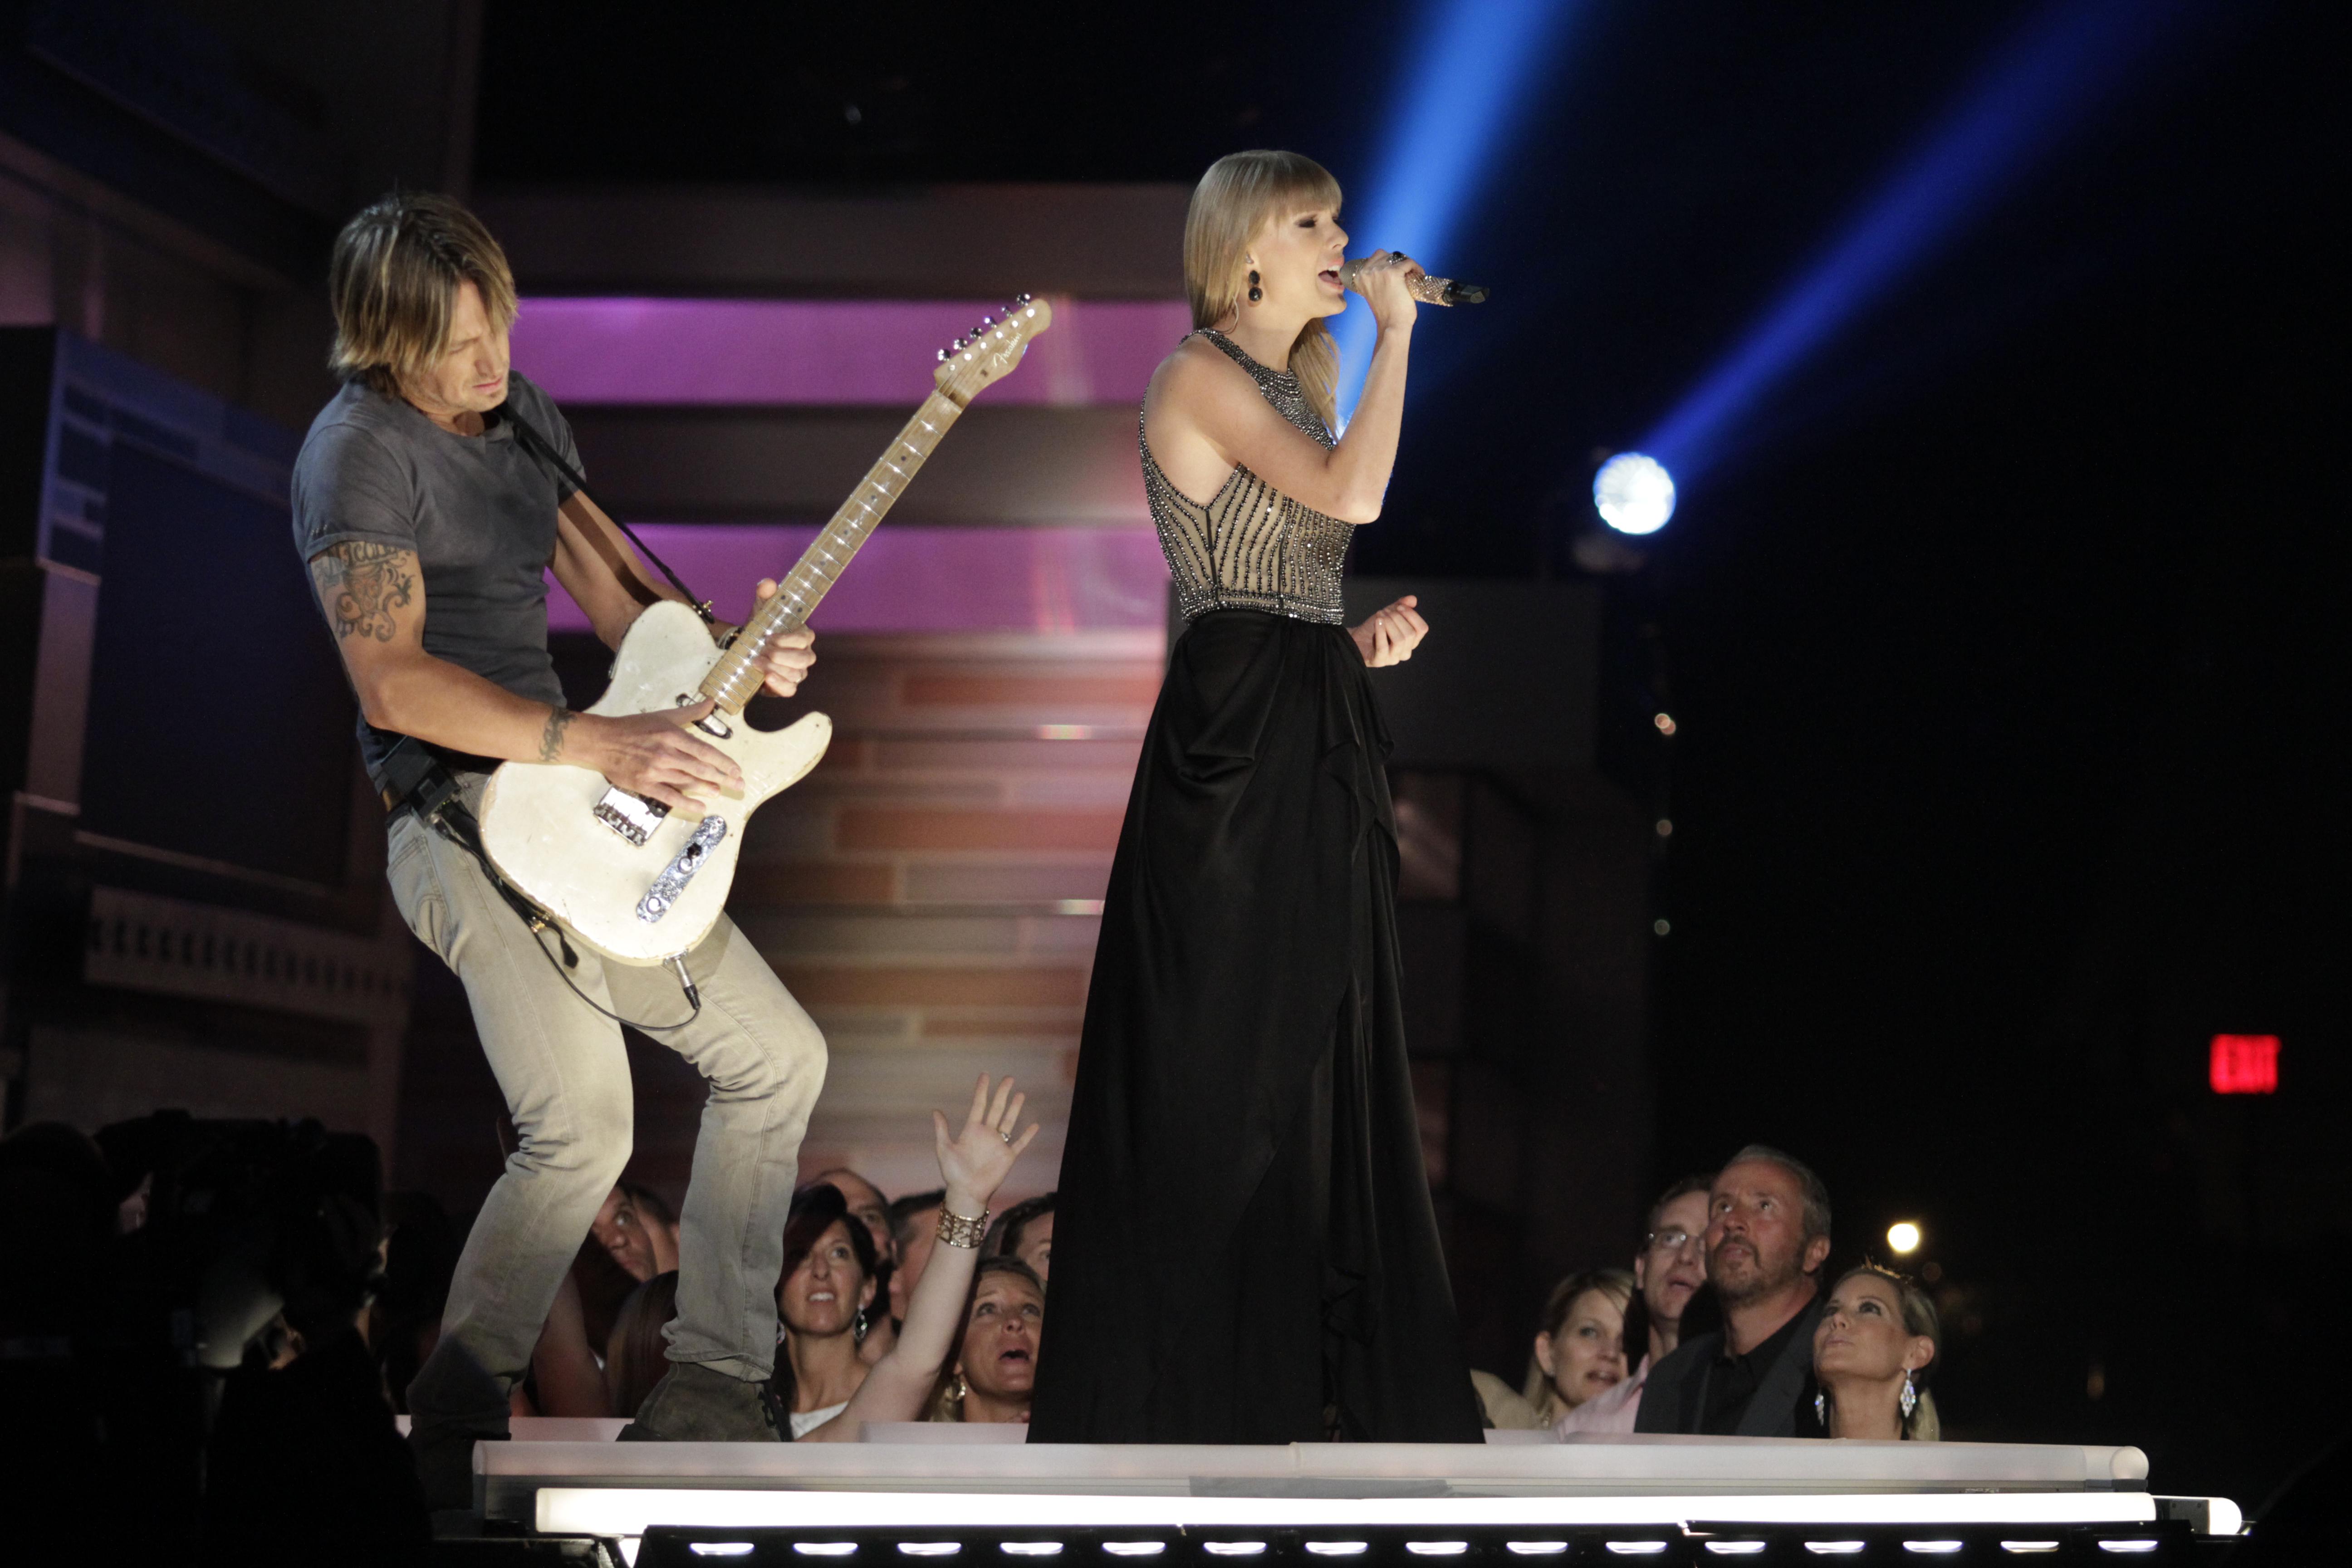 Keith Urban & Taylor Swift